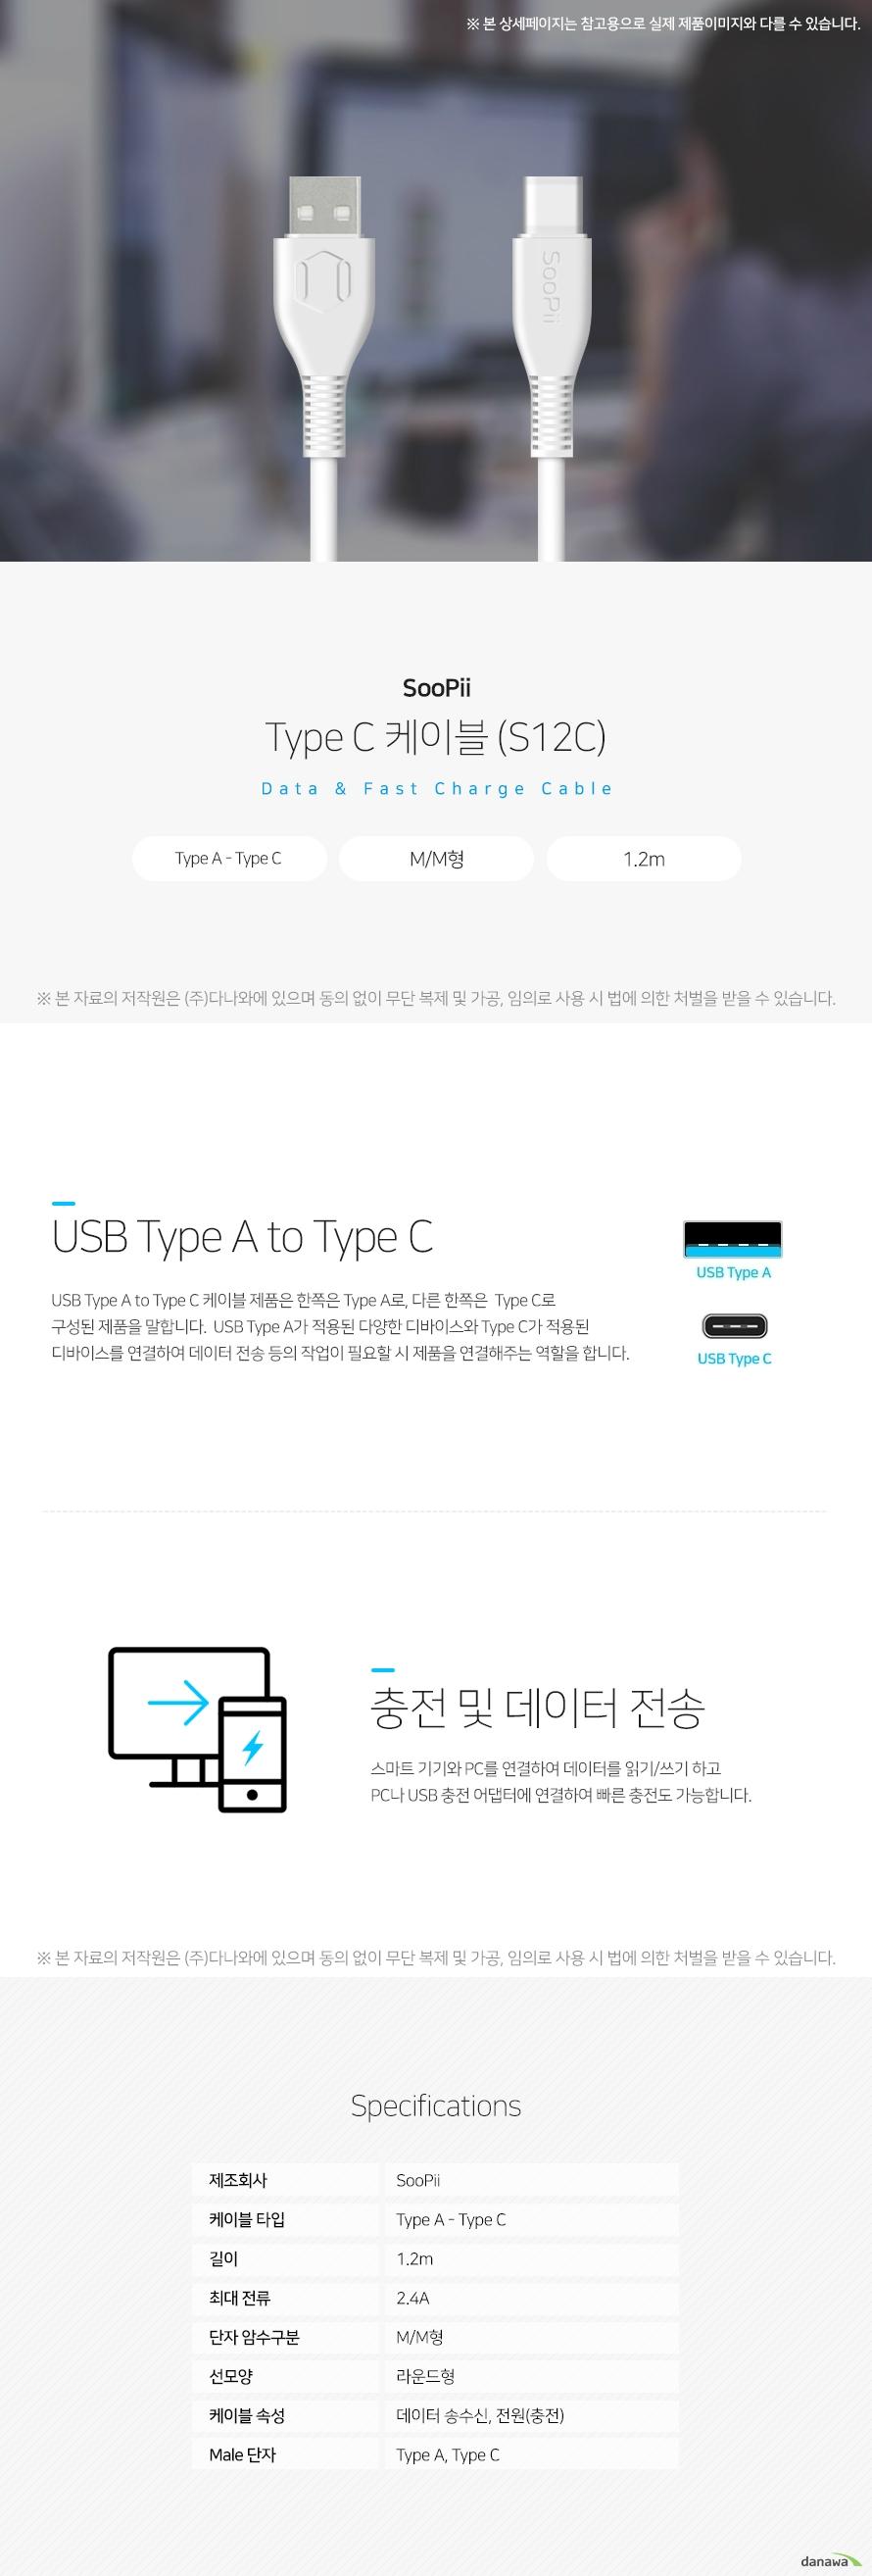 SooPii Type C 케이블 (S12C) USB Type A to Type C USB Type A to Type C 케이블 제품은 한쪽은 Type A로, 다른 한쪽은  Type C로 구성된 제품을 말합니다.  USB Type A가 적용된 다양한 디바이스와 Type C가 적용된 디바이스를 연결하여 데이터 전송 등의 작업이 필요할 시 제품을 연결해주는 역할을 합니다.  충전 및 데이터 전송 스마트 기기와 PC를 연결하여 데이터를 읽기/쓰기 하고 PC나 USB 충전 어댑터에 연결하여 빠른 충전도 가능합니다. 스펙 제조회사 SooPii 케이블 타입 Type A - Type C 길이 1.2m 최대 전류 2.4A 단자 암수구분 M/M형 선모양 라운드형 케이블 속성 데이터송수신, 전원(충전) Male 단자 Type A, Type C